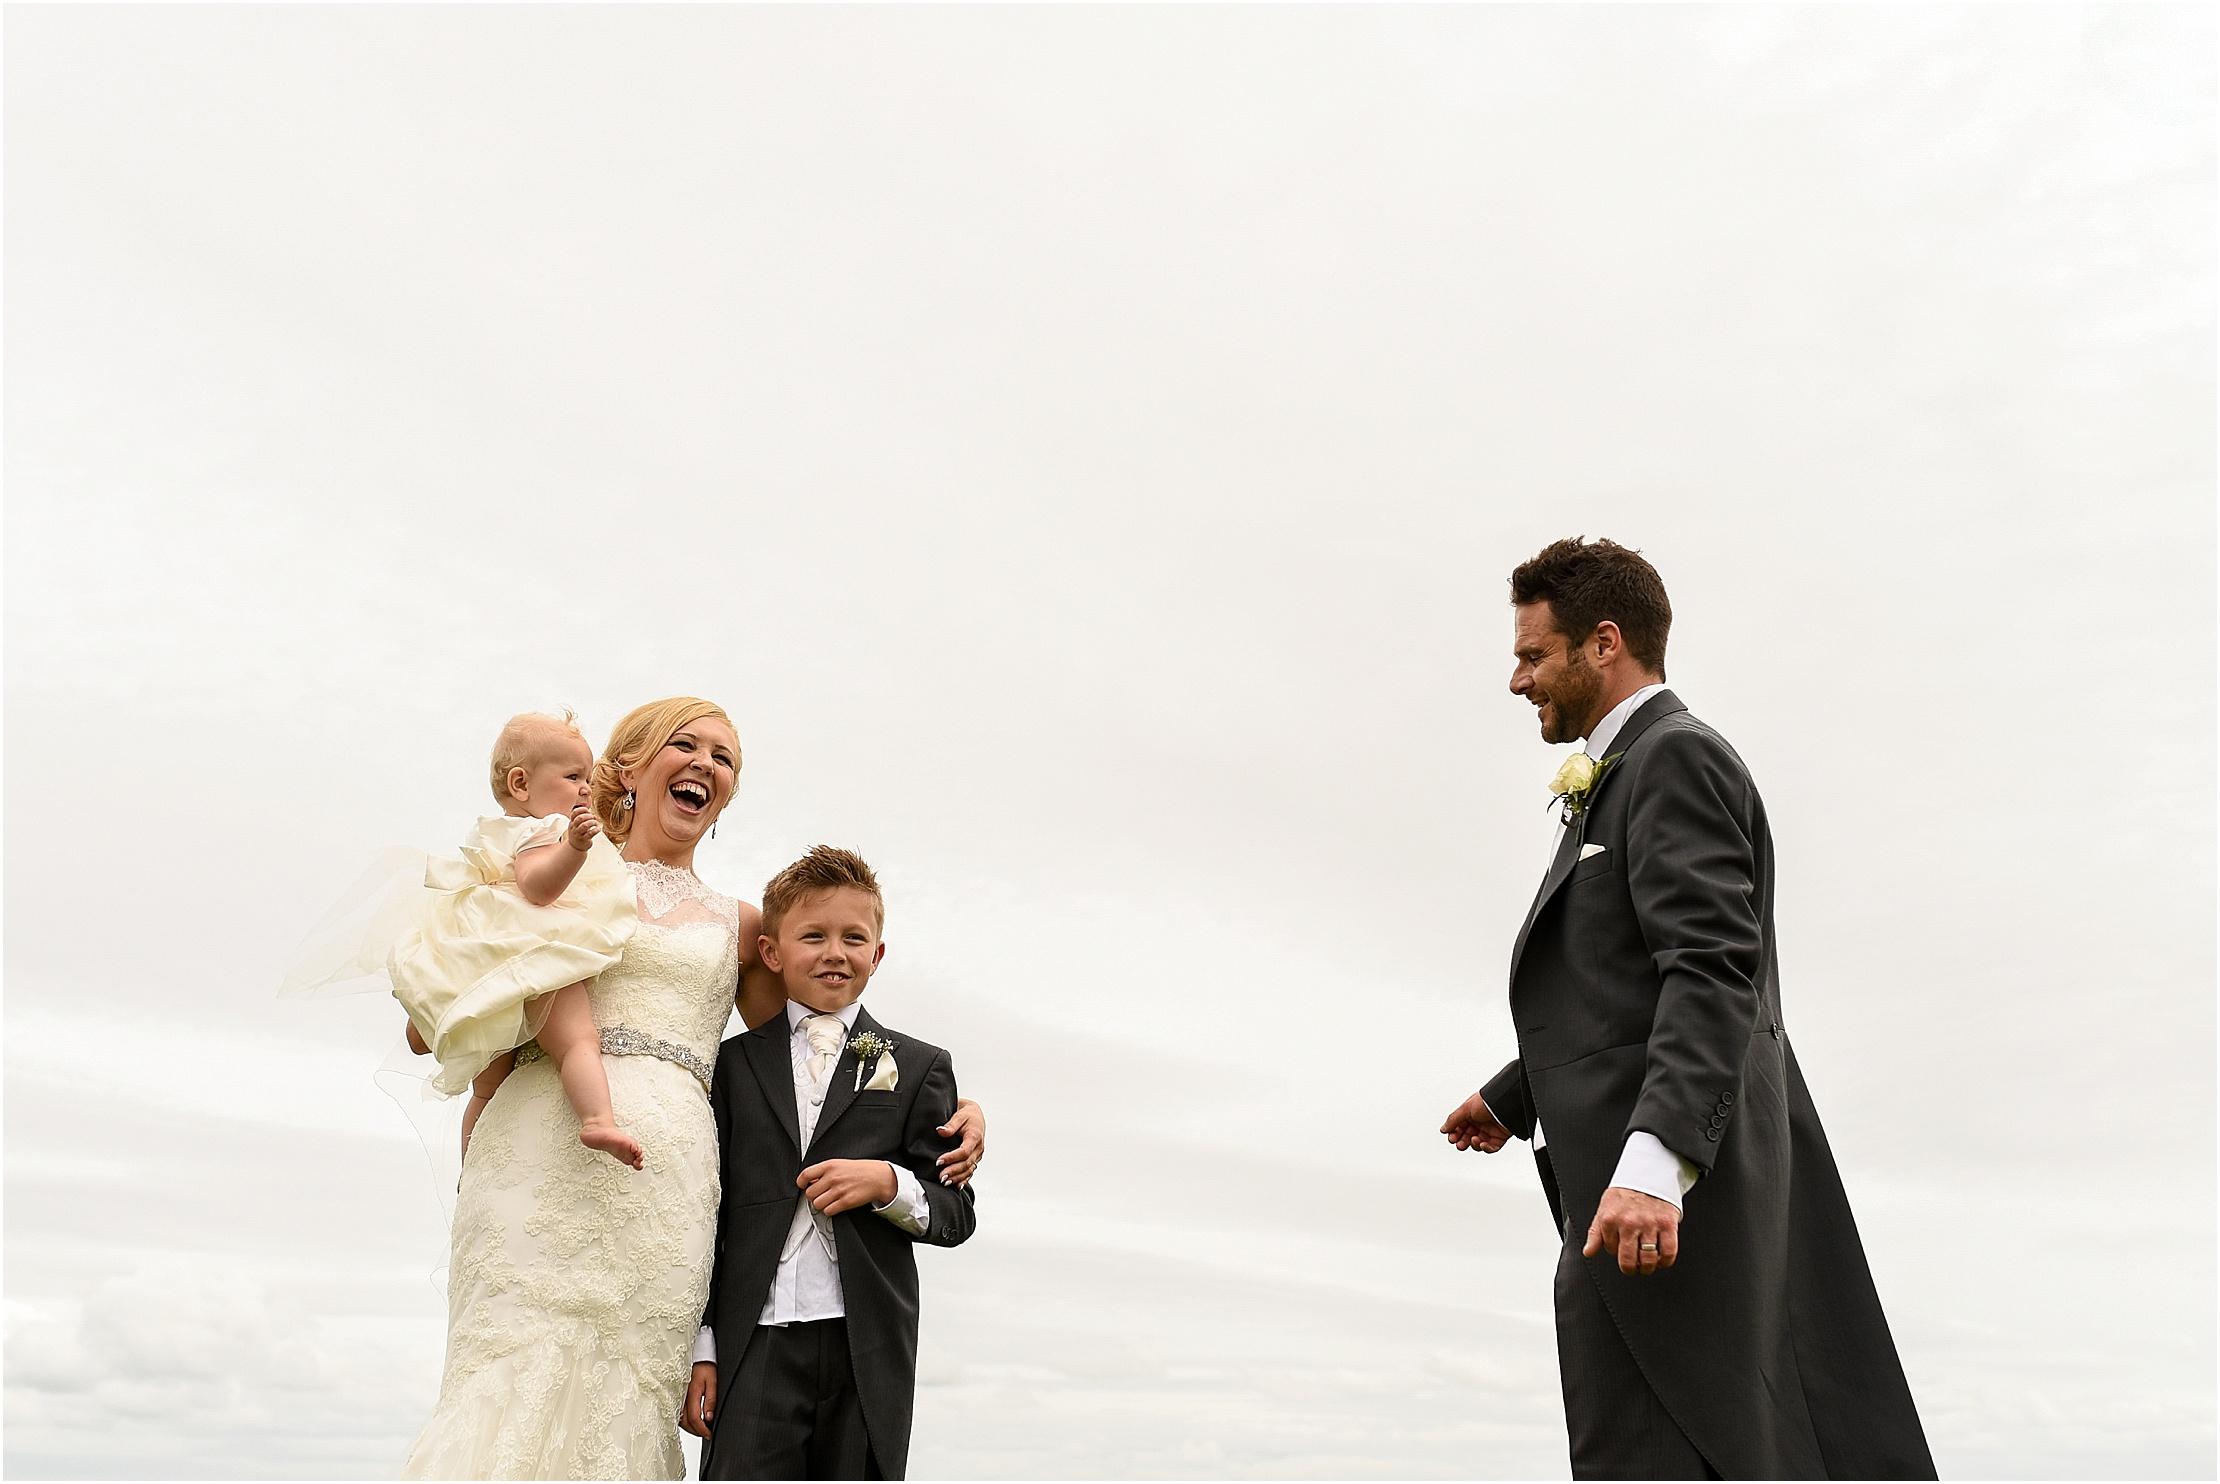 staining-lodge-wedding-100.jpg